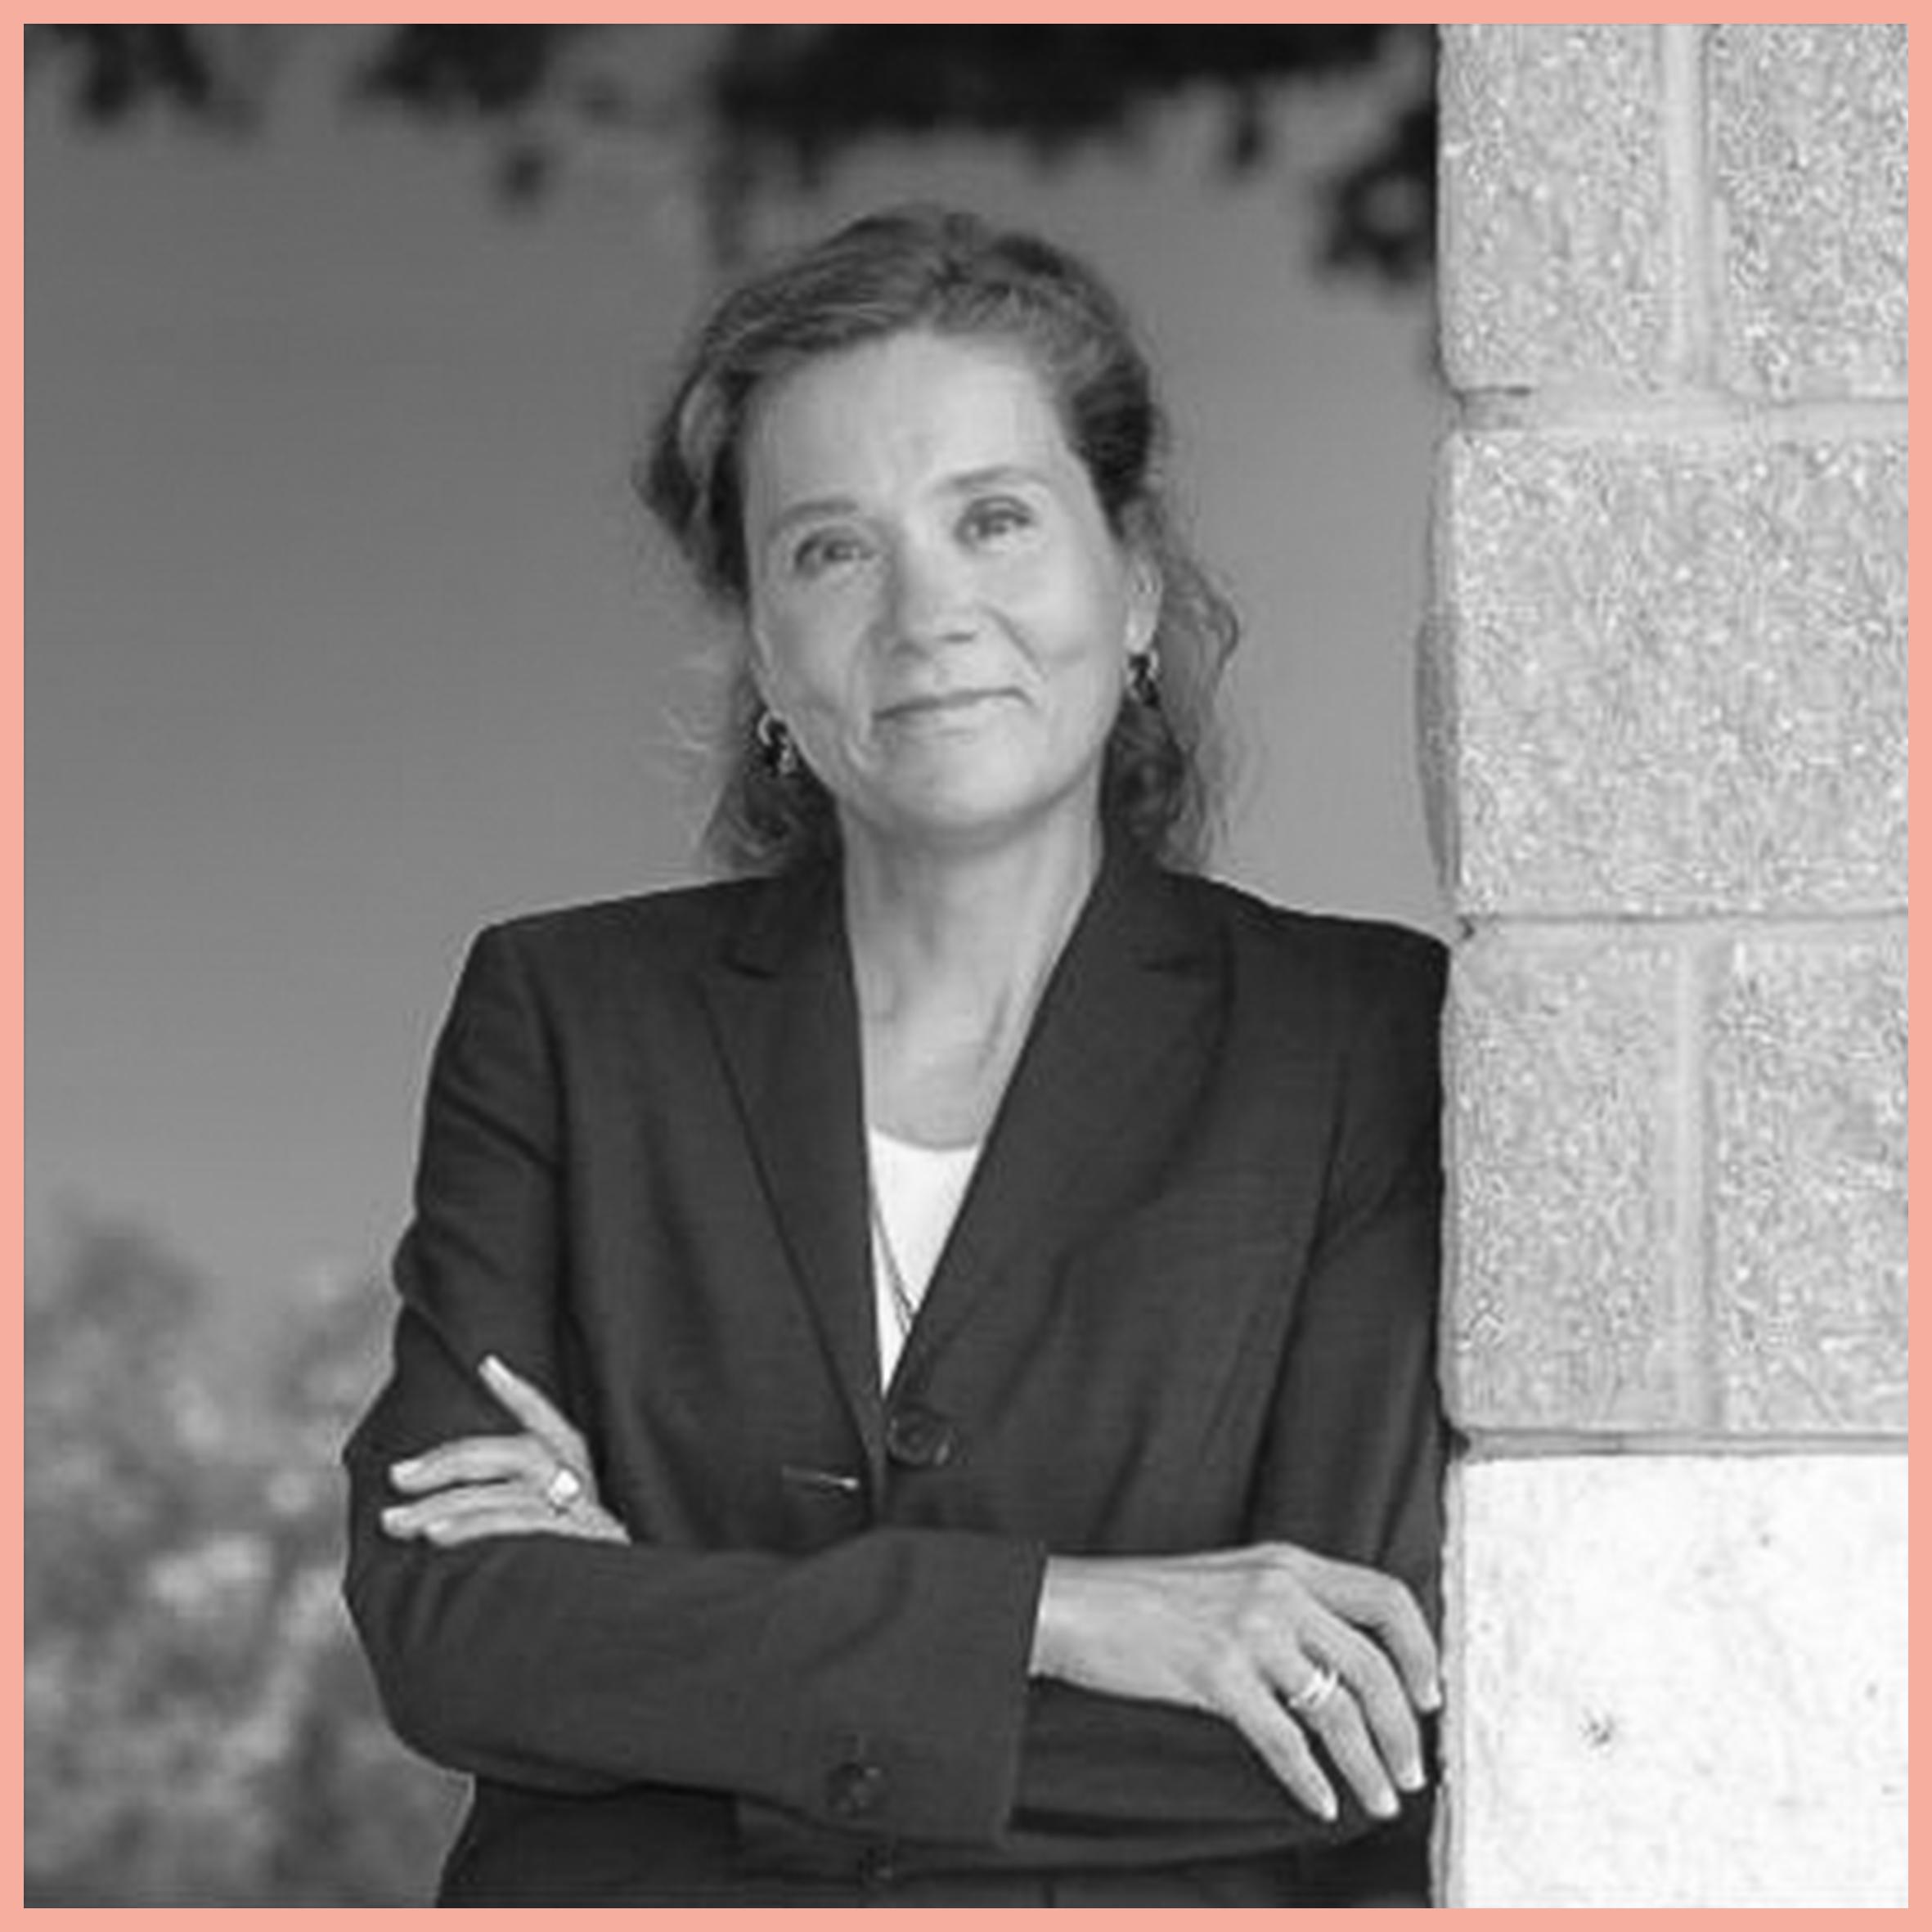 Gabi Zedlmayer - Social Innovator and former Chief Progress Officer at the Hewlett-Packard Company (HP) and Hewlett Packard Enterprise (HPE)